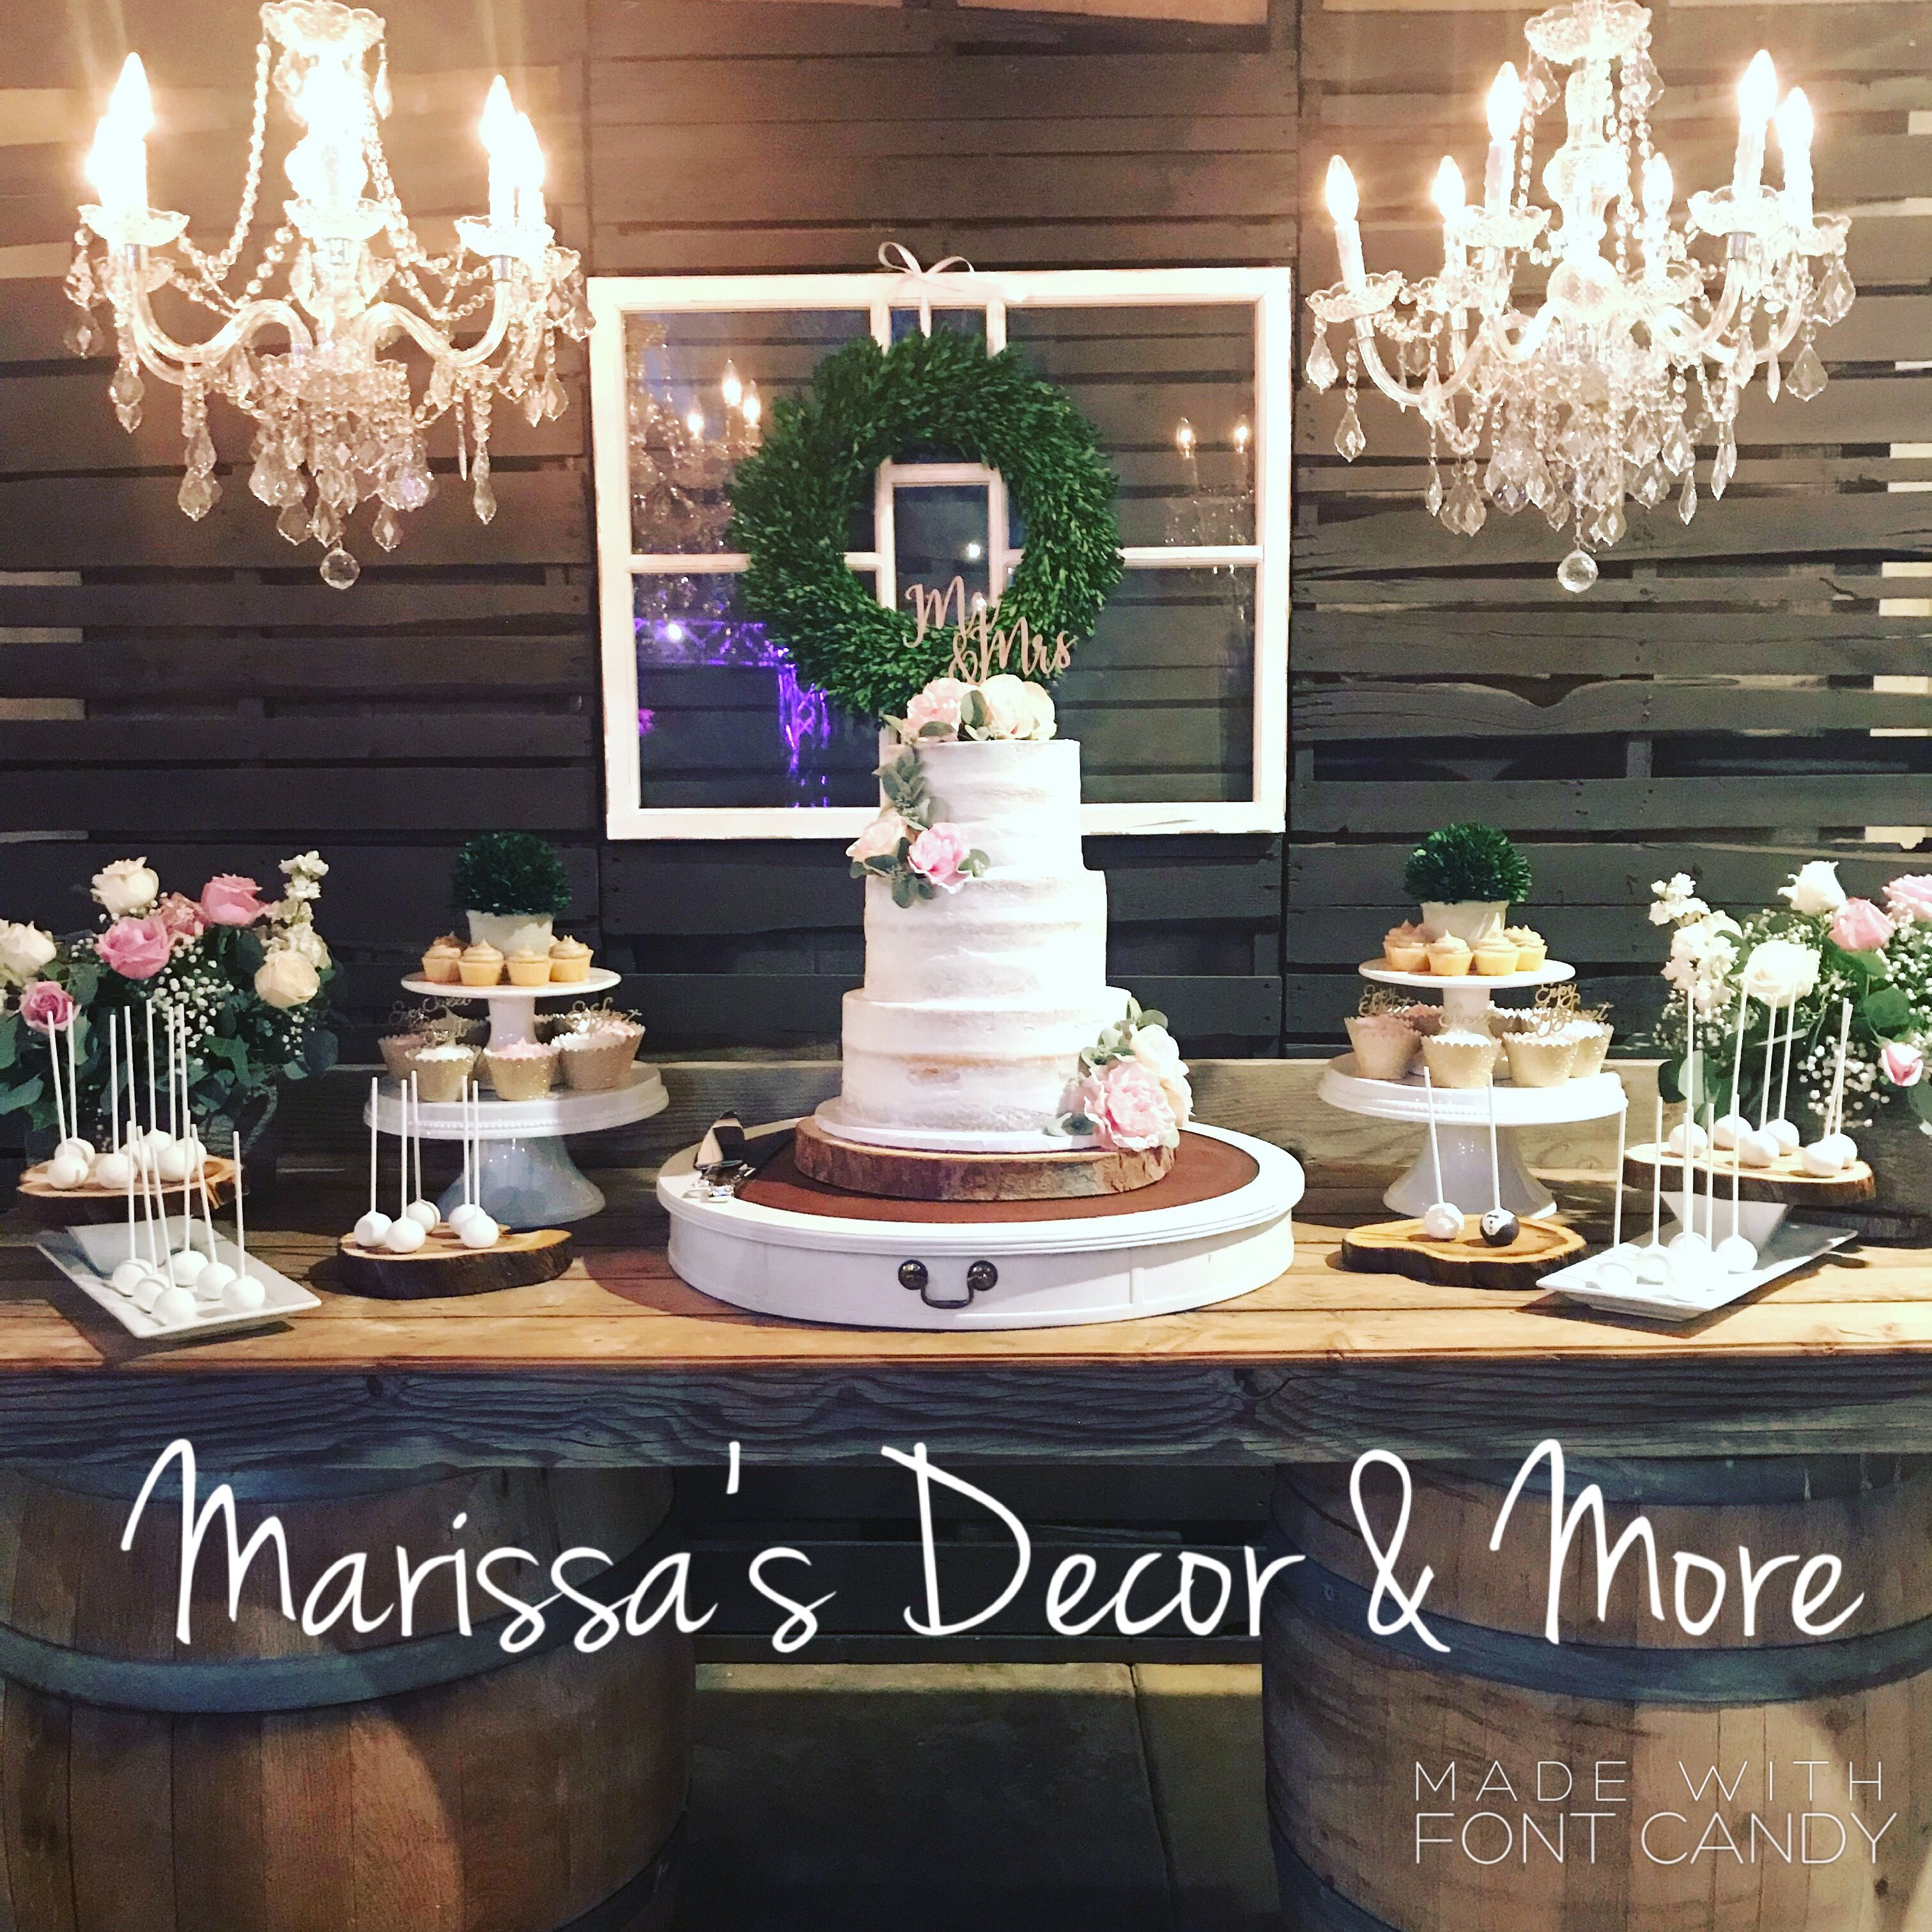 Rustic Wedding Cake Table Wedding Cake Table Rustic Wedding Cake Table Decorations